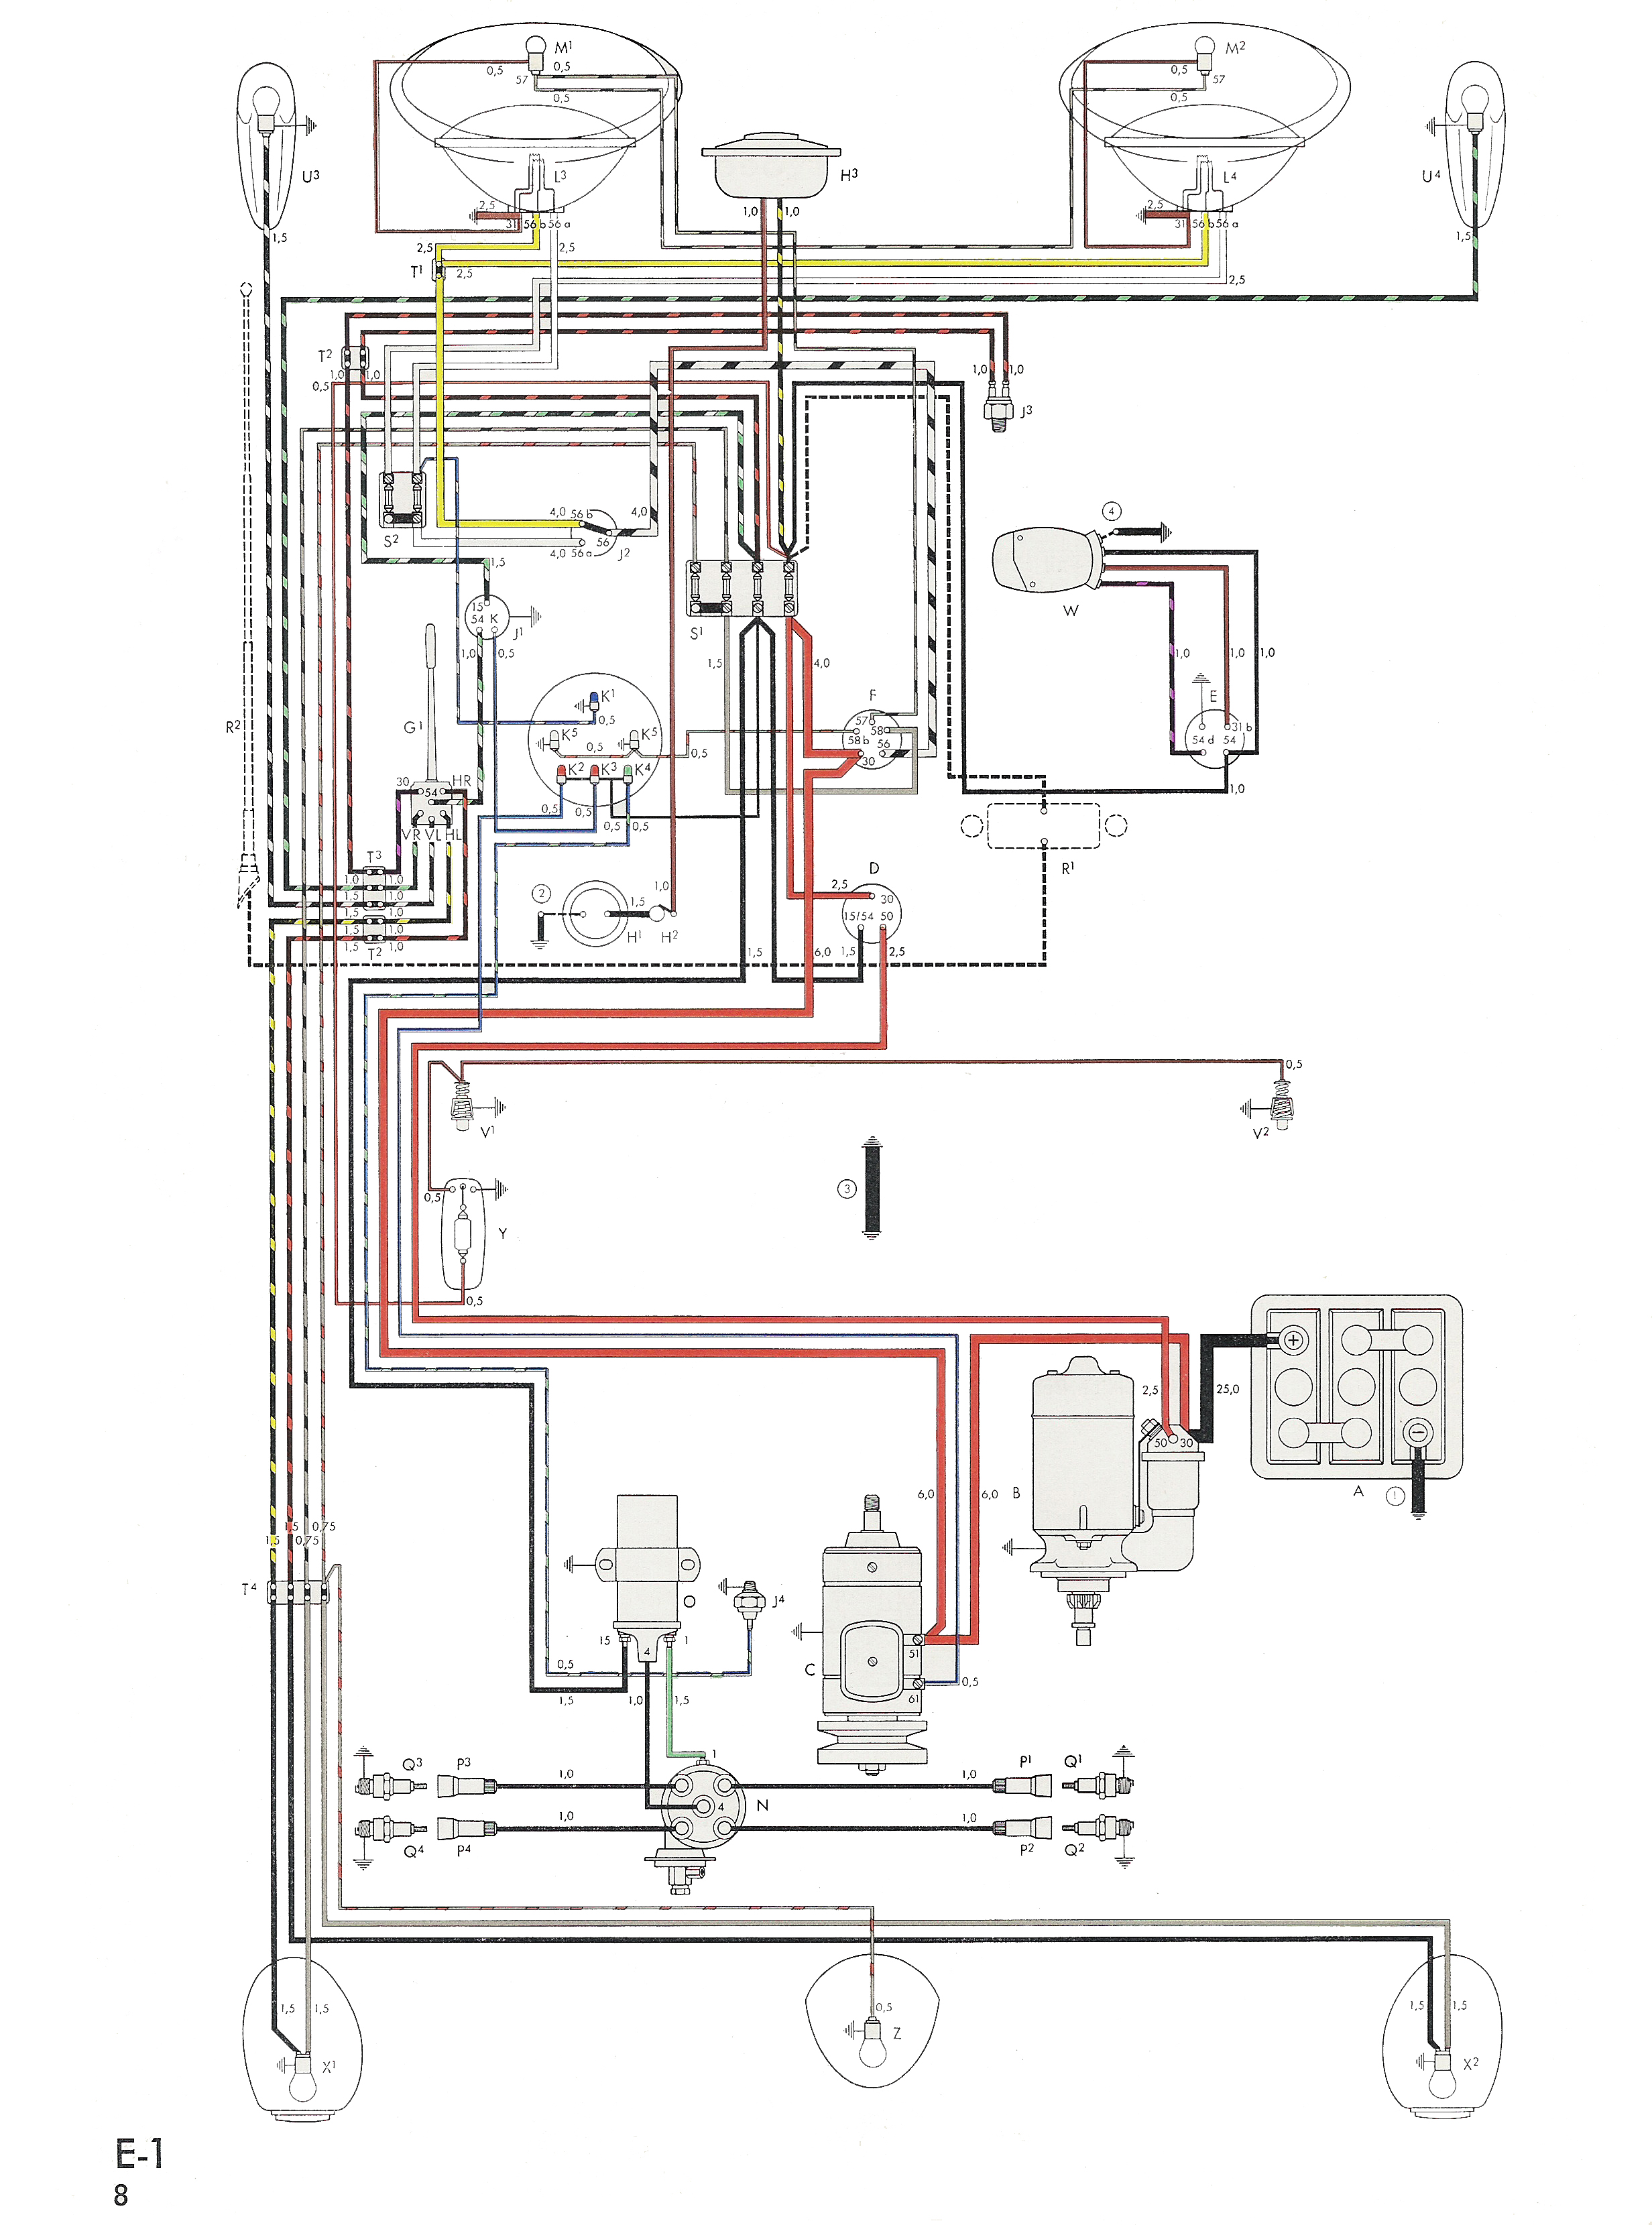 bug_58_USA_300dpi?resize\\\=665%2C896\\\&ssl\\\=1 74 vw super beetle wiring diagram wiring diagrams 1971 vw super beetle wiring diagram at virtualis.co